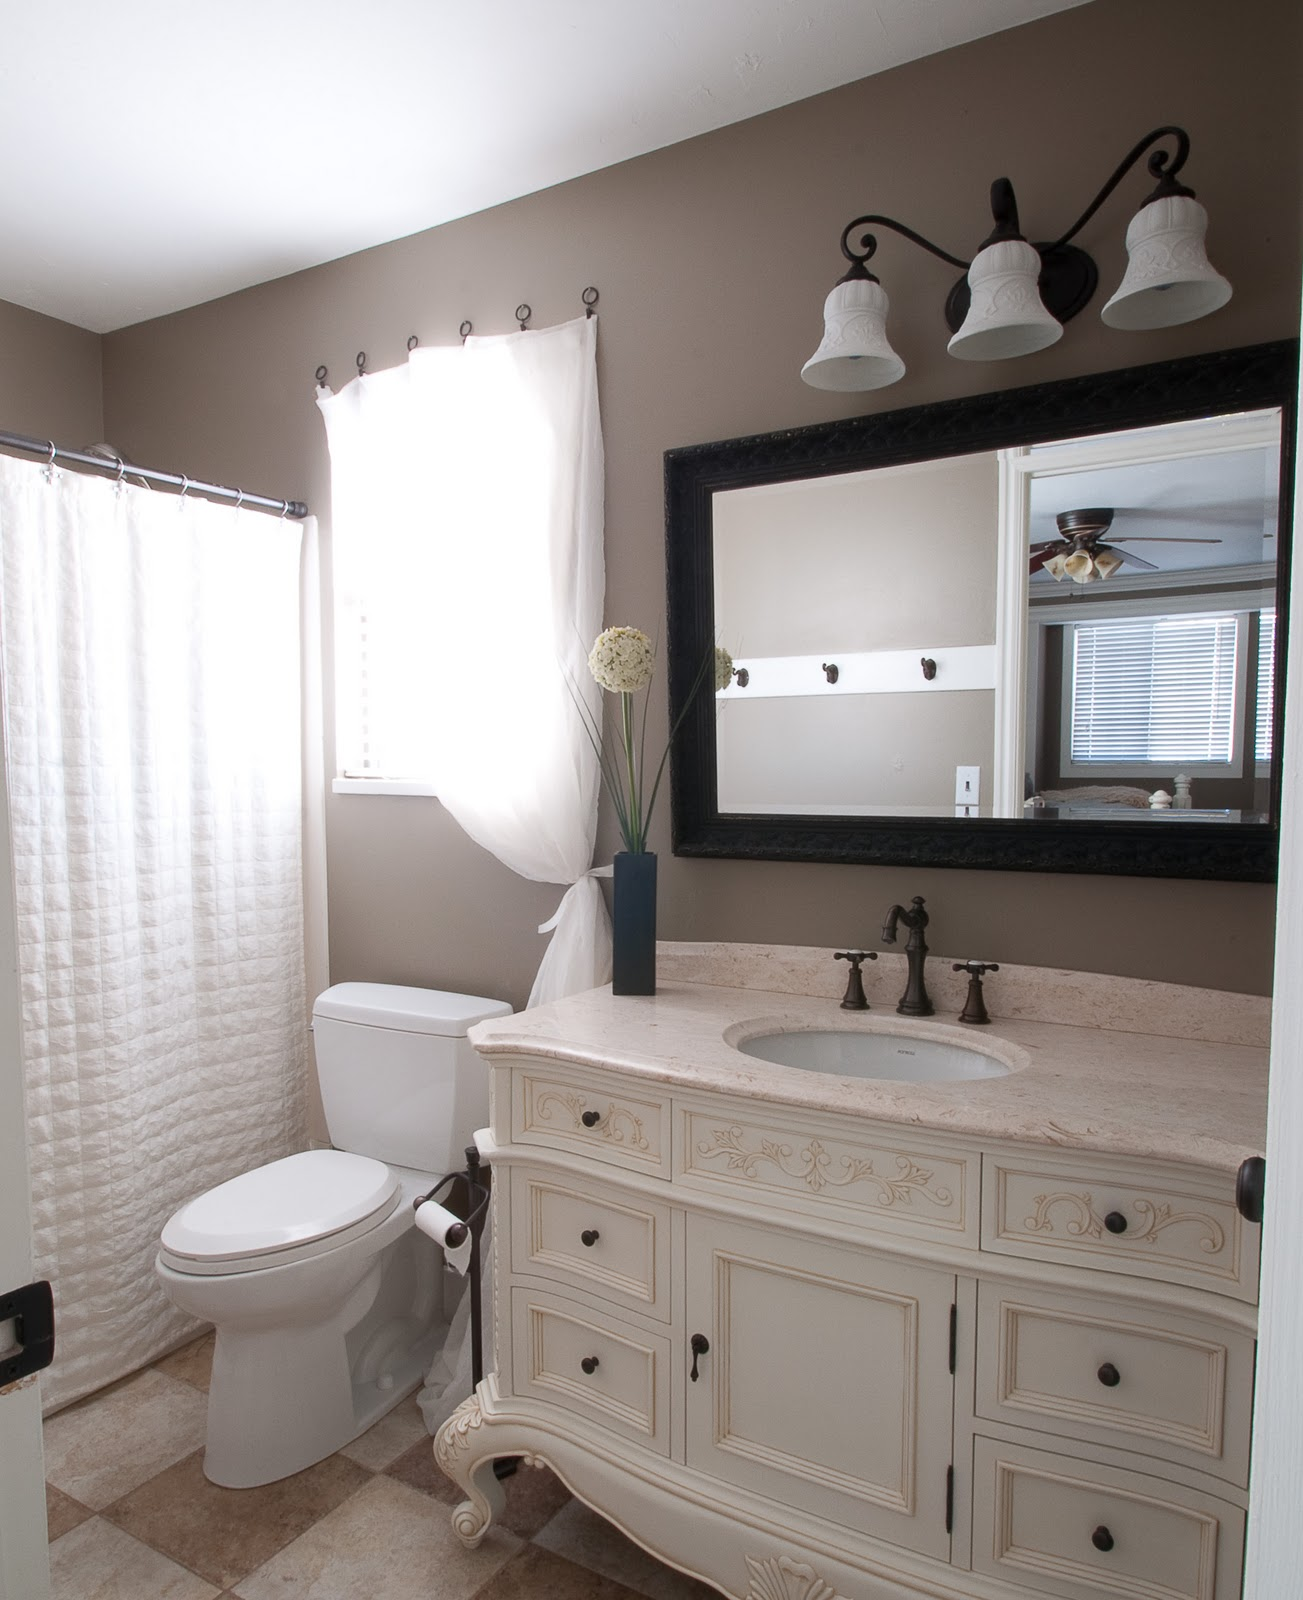 Start at Home Bathroom REDO